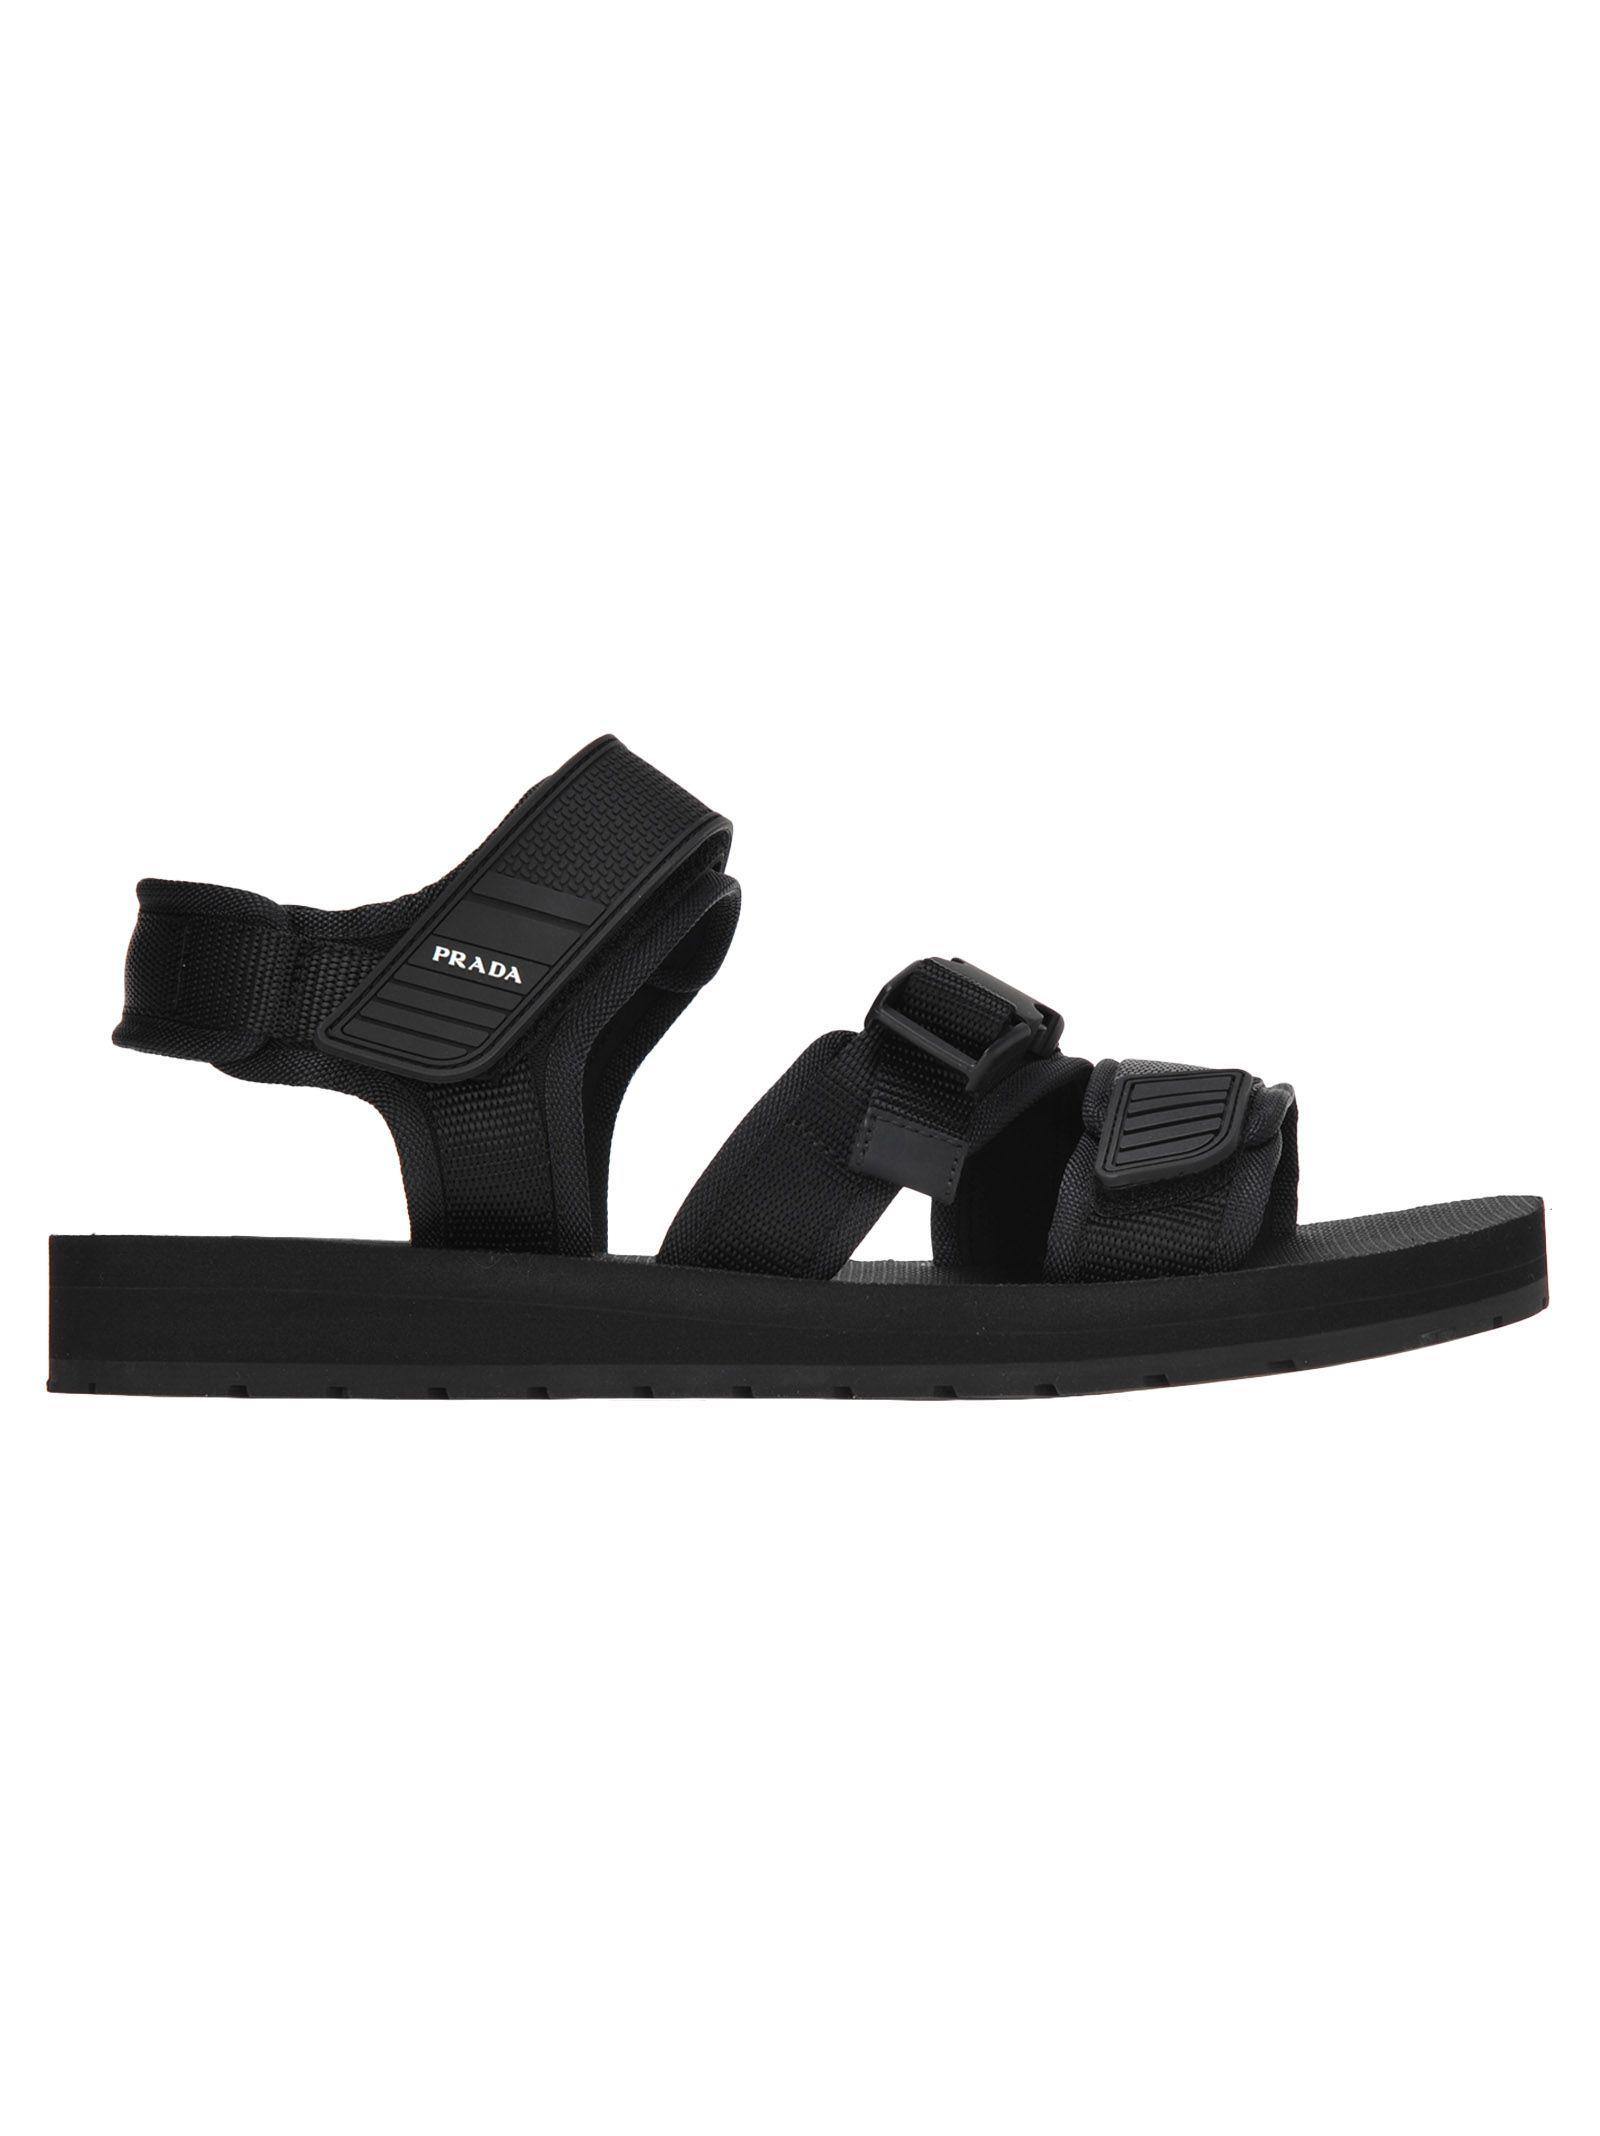 Prada Dad Style Sandals In Black